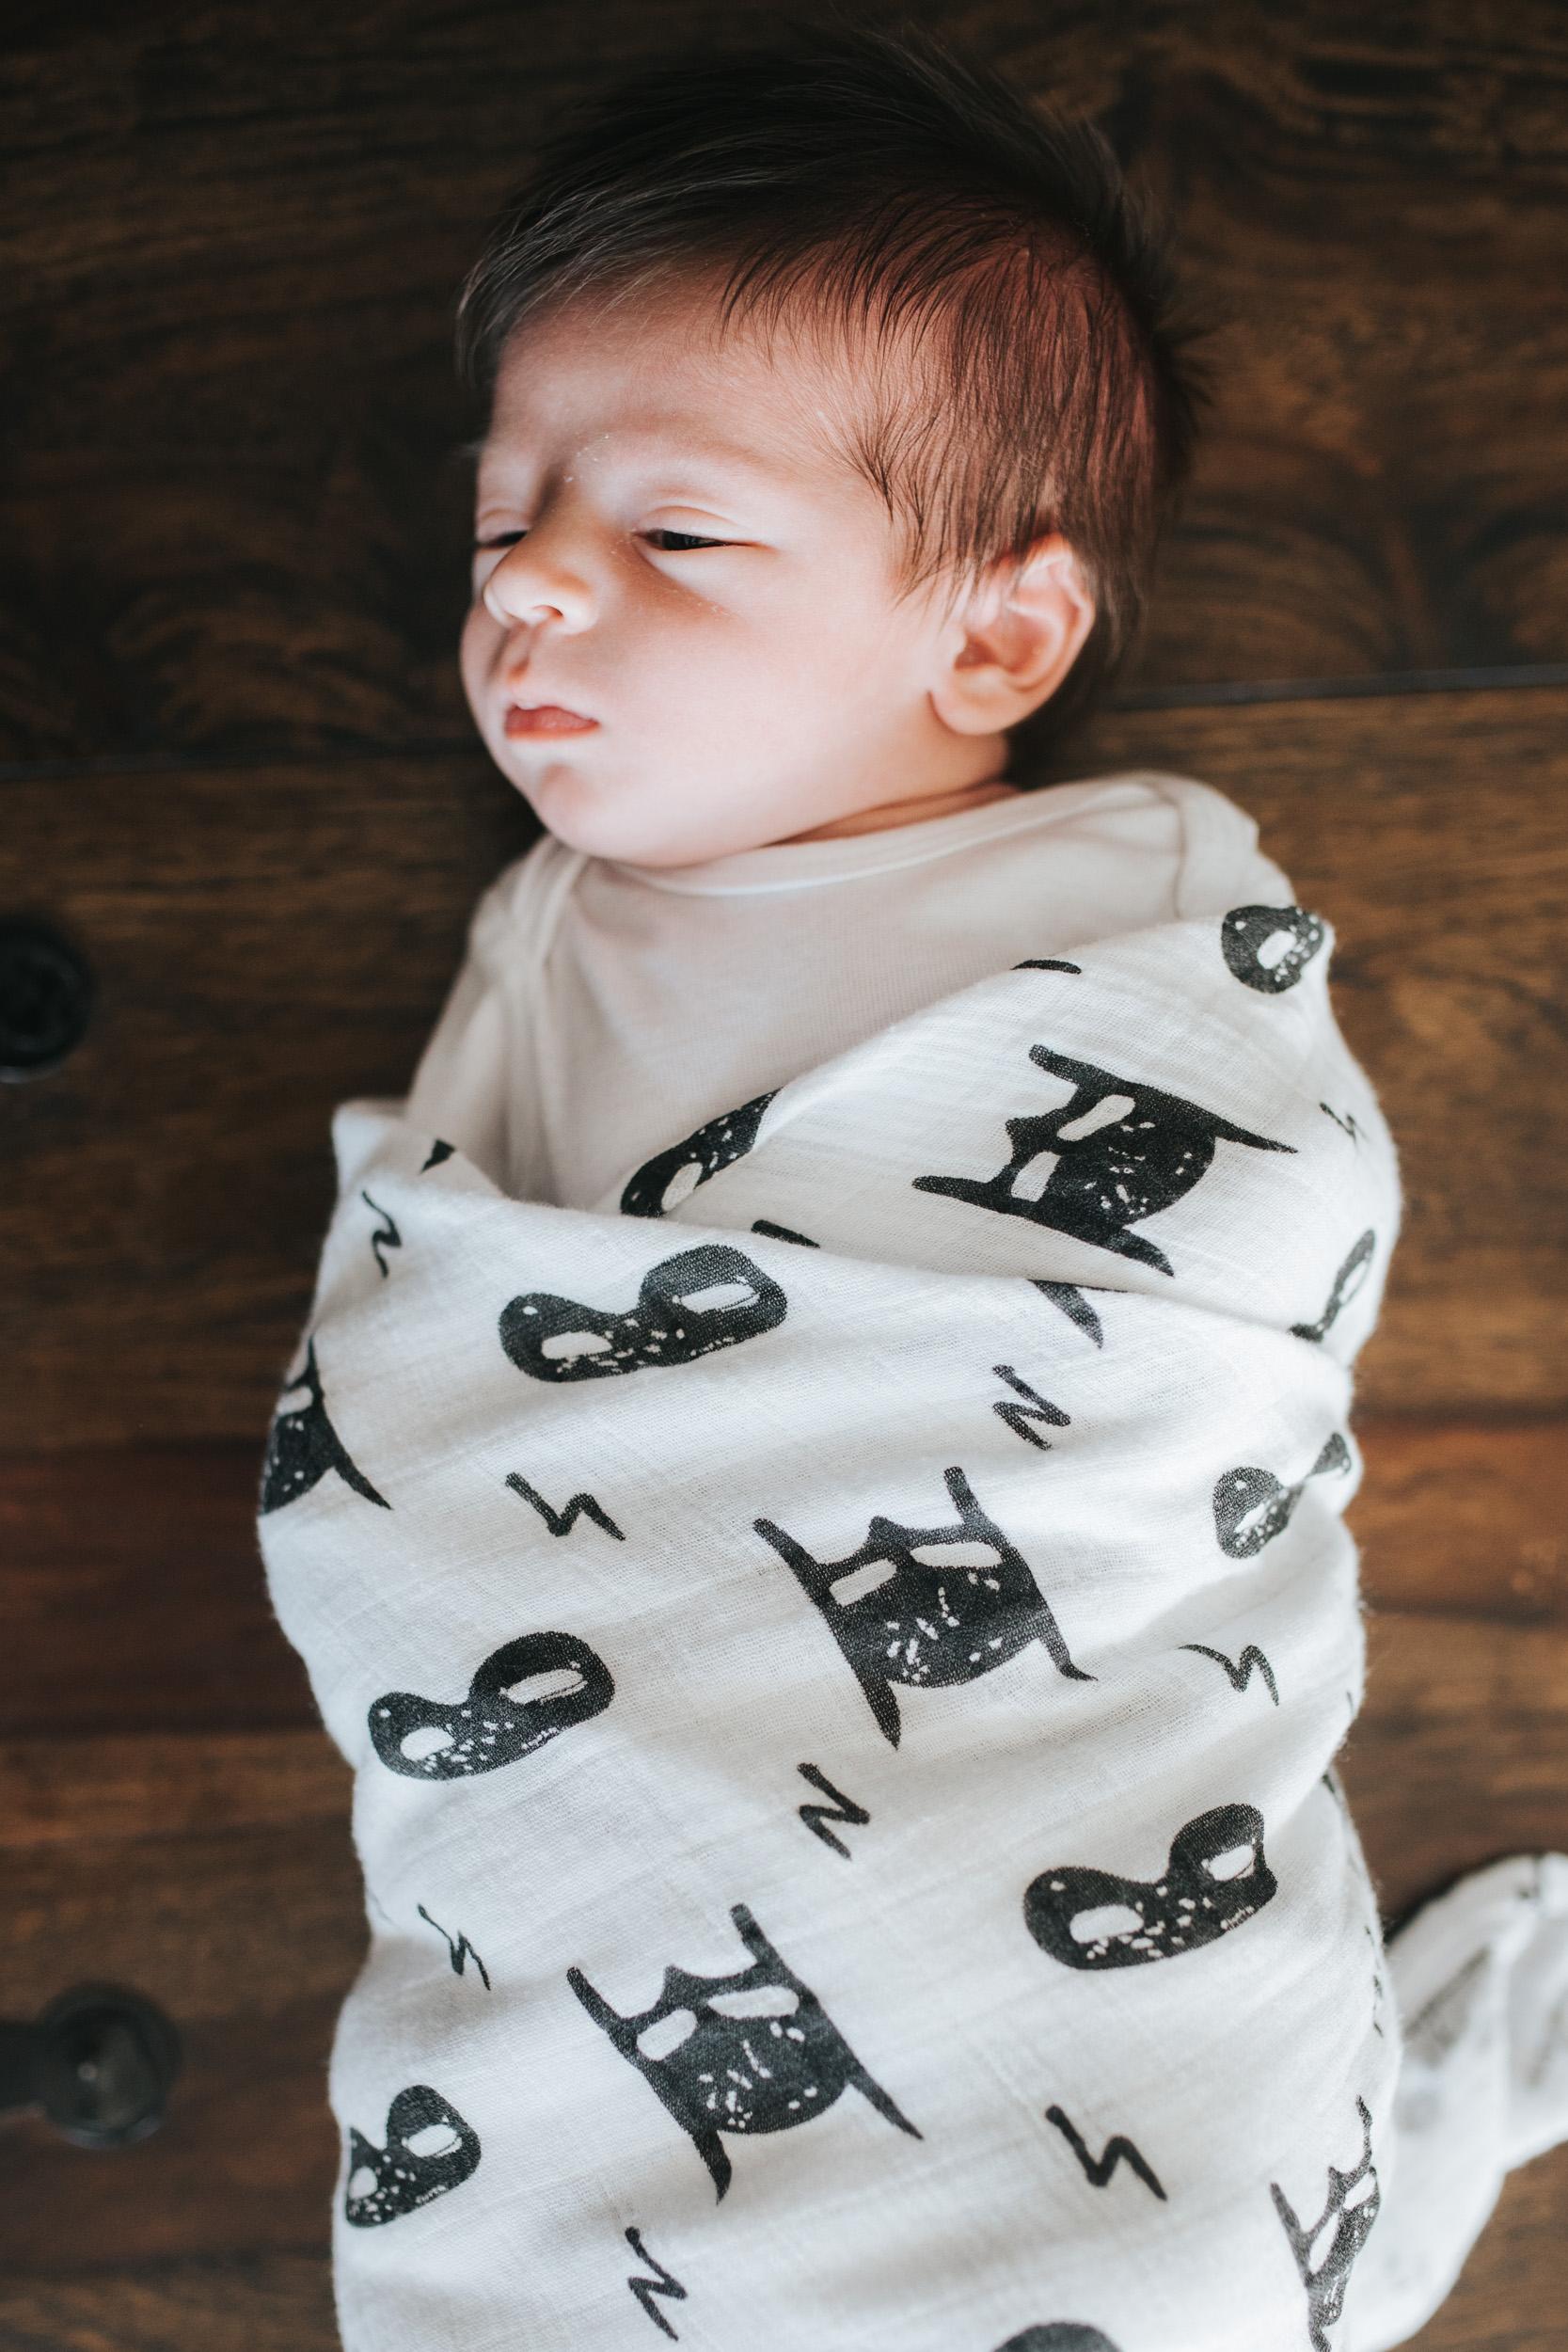 StephenPaynePhotography_BabyTaylor-8.jpg